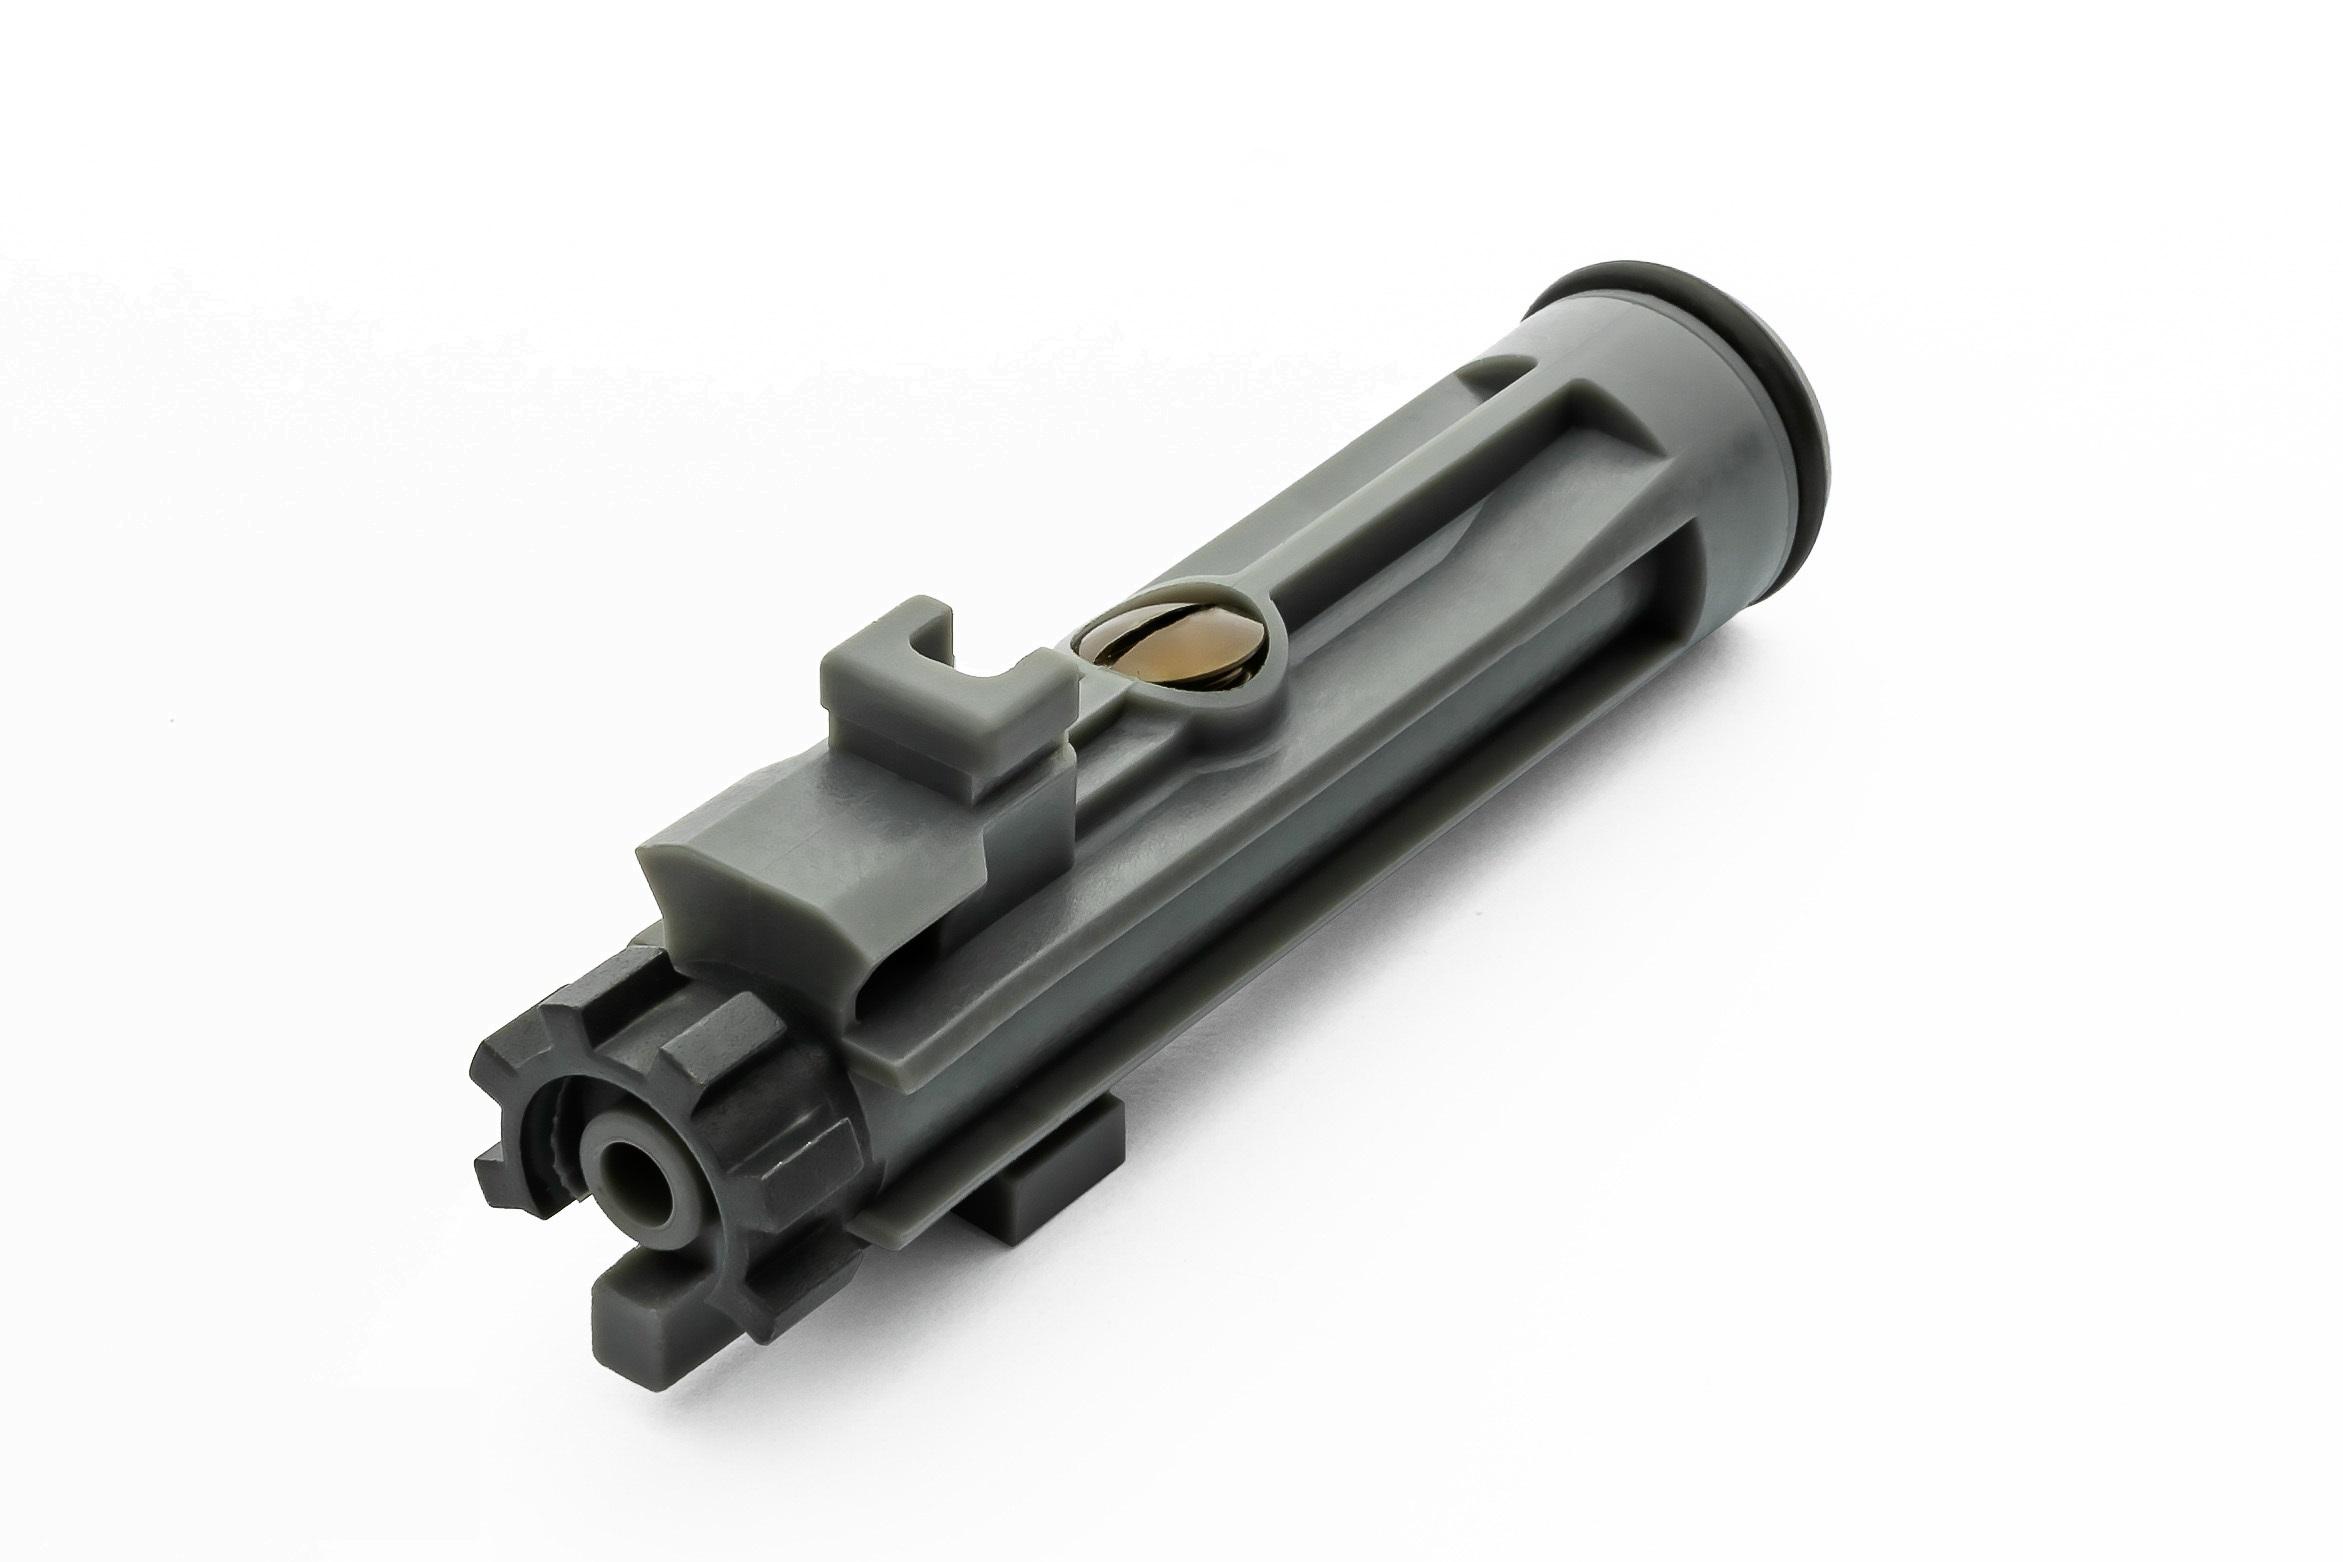 RA-TECH マグネティックロックNPAS内蔵 強化樹脂ローディングノズルセット GHK M4 GBB対応